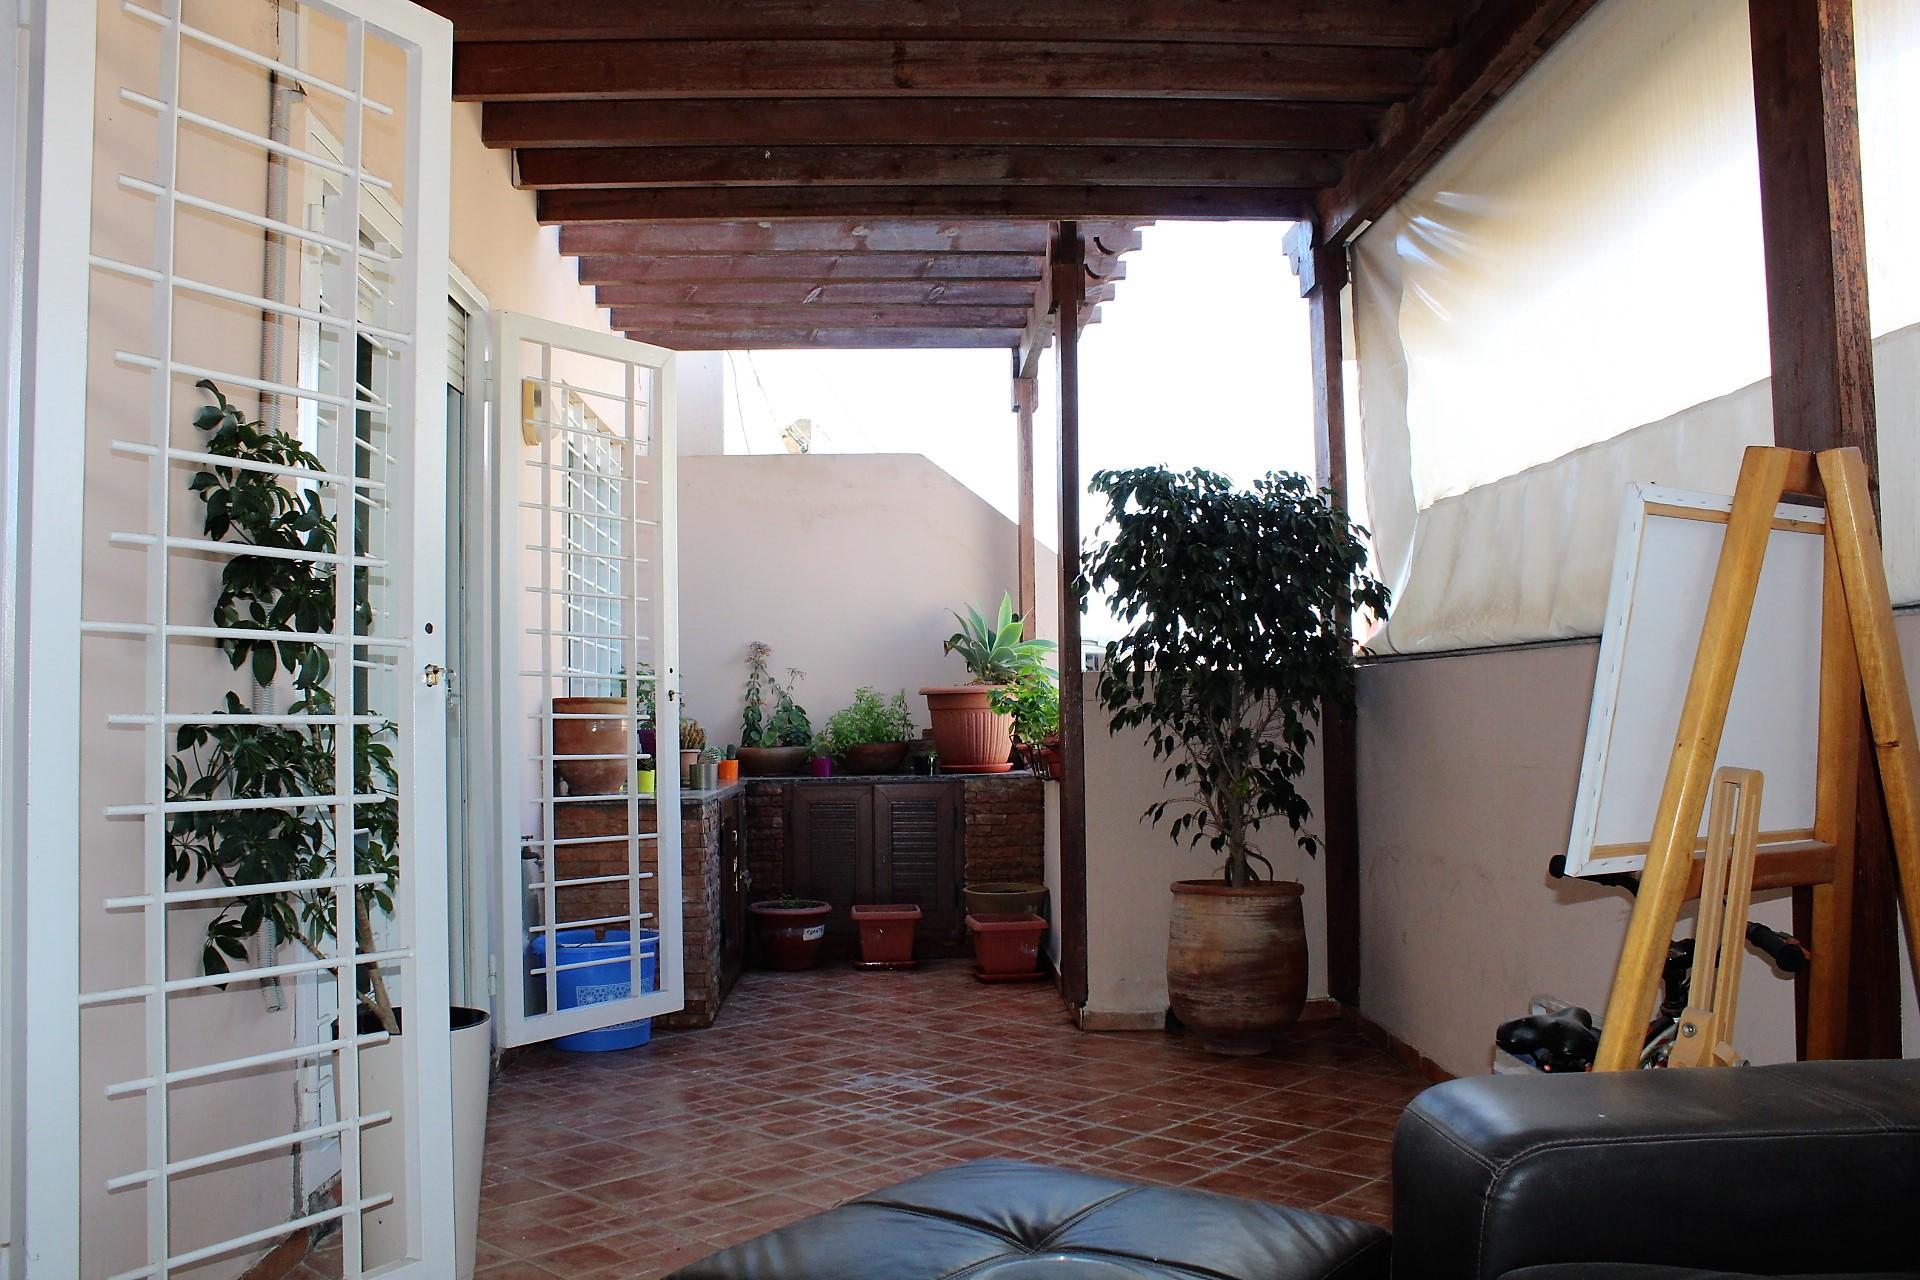 Confortable et coquet appartement a acheter Maarif extention Casablanca